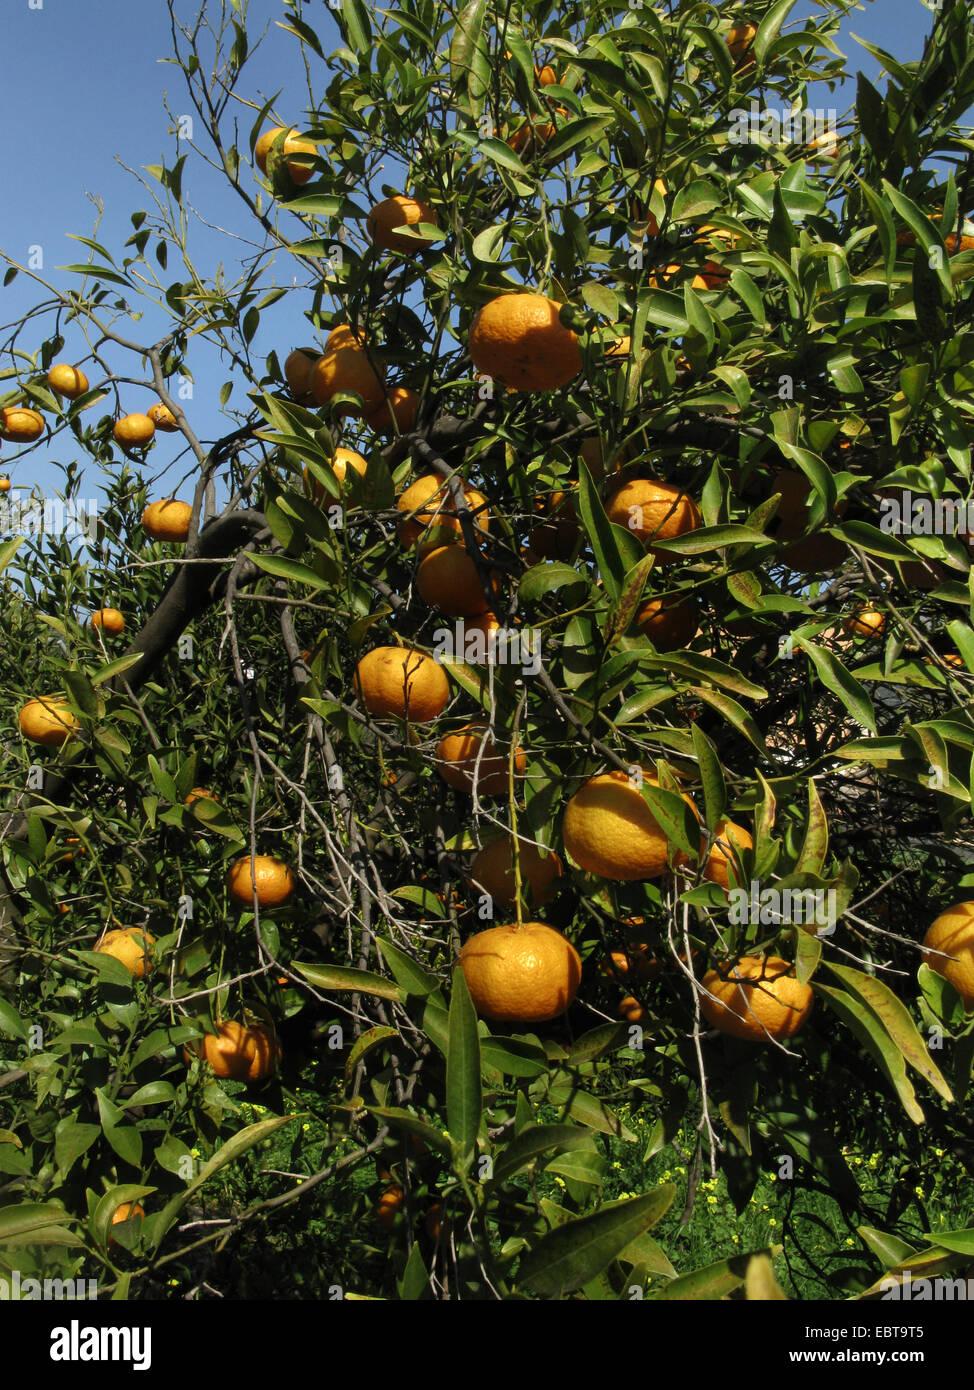 mandarin, tangerine (Citrus reticulata), mandarins on a tree, Spain, Balearen, Majorca - Stock Image